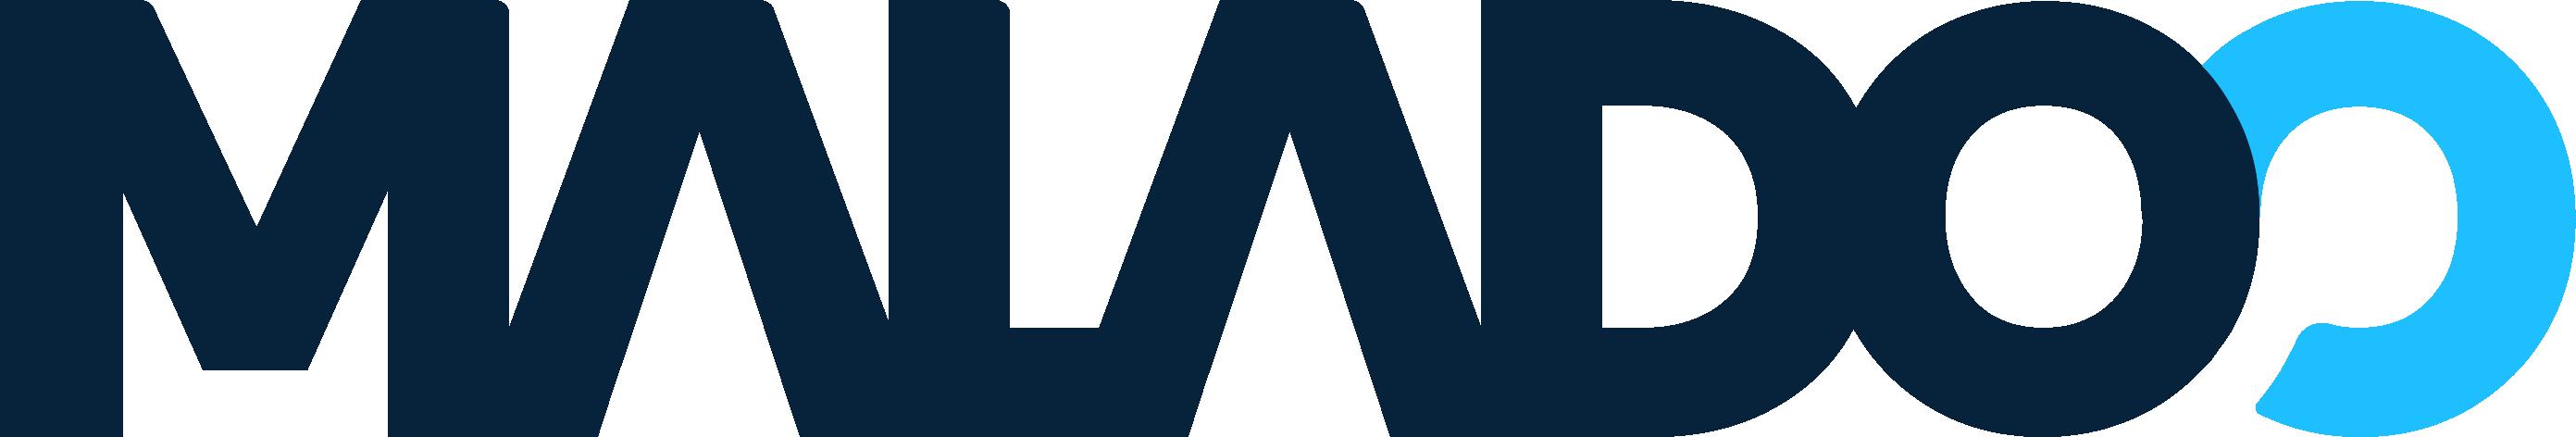 Zink Metselwerken logo